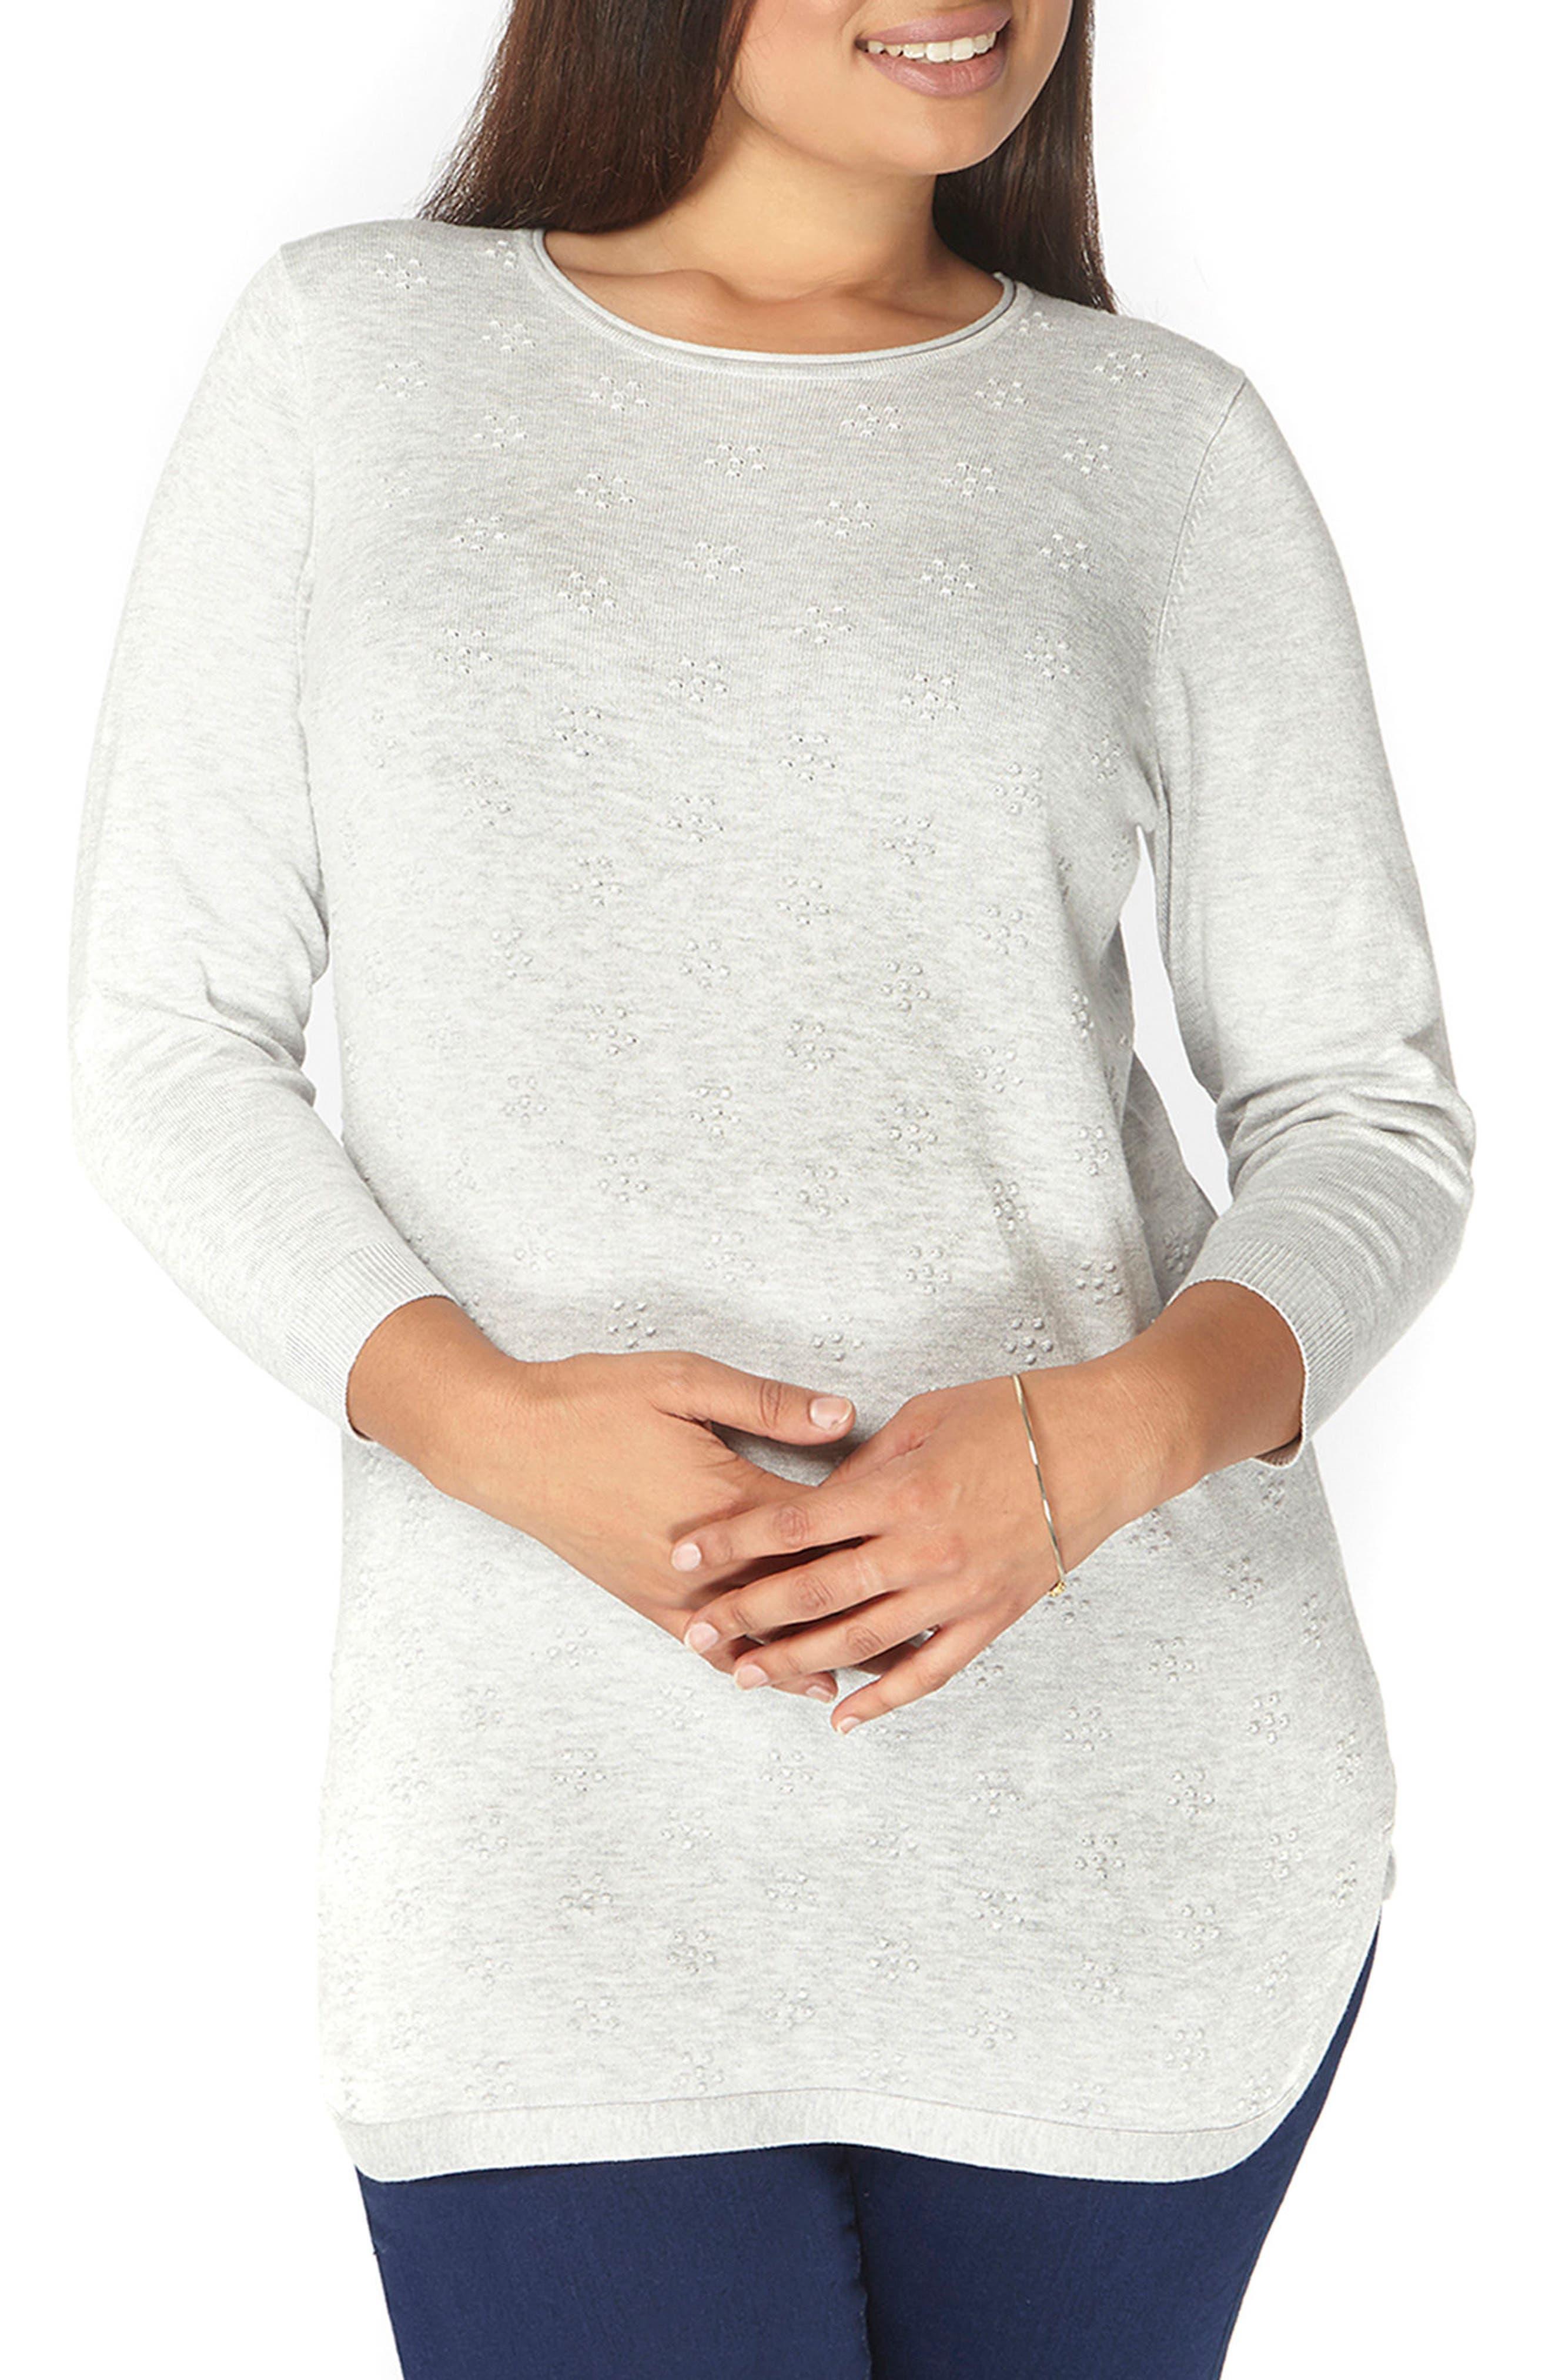 Dot Texture Sweater,                             Main thumbnail 1, color,                             Grey